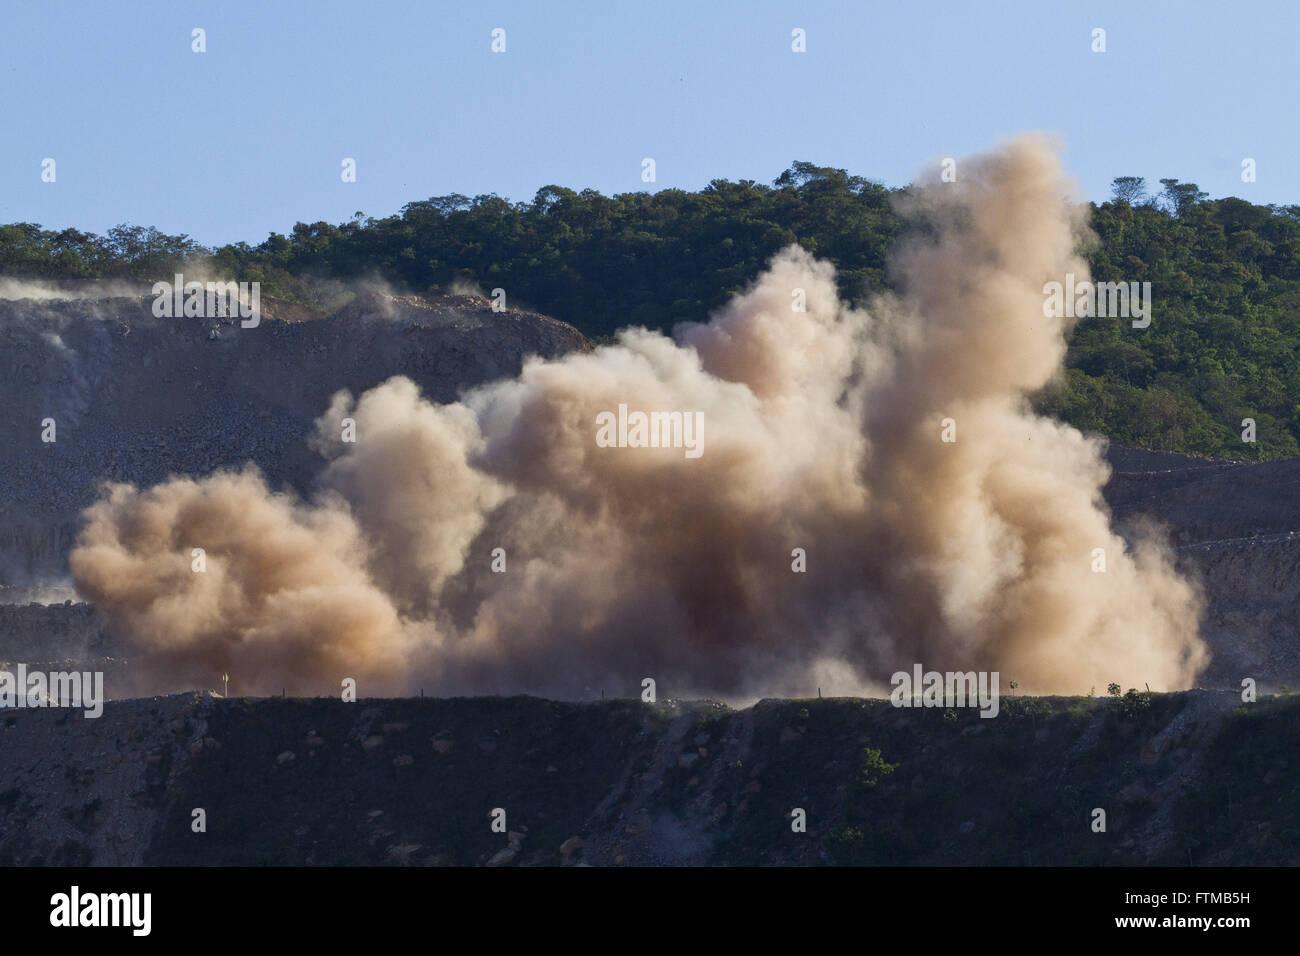 Detonation of explosives in excavation works - Stock Image